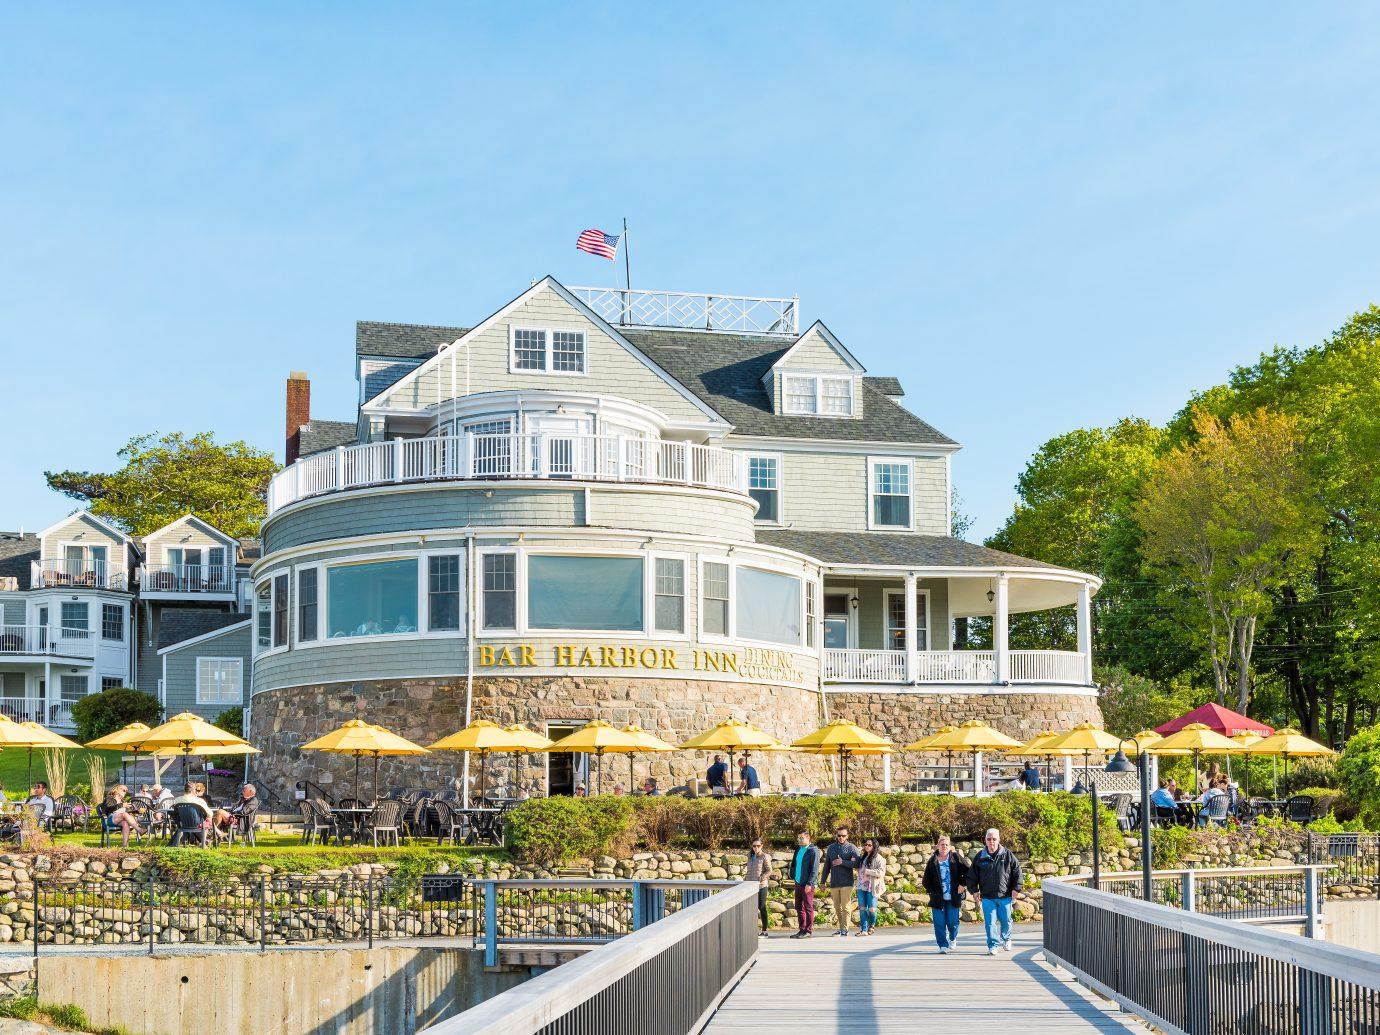 Bar Harbor: Oceanfront resort inn with waterfront restaurant in downtown village in summer